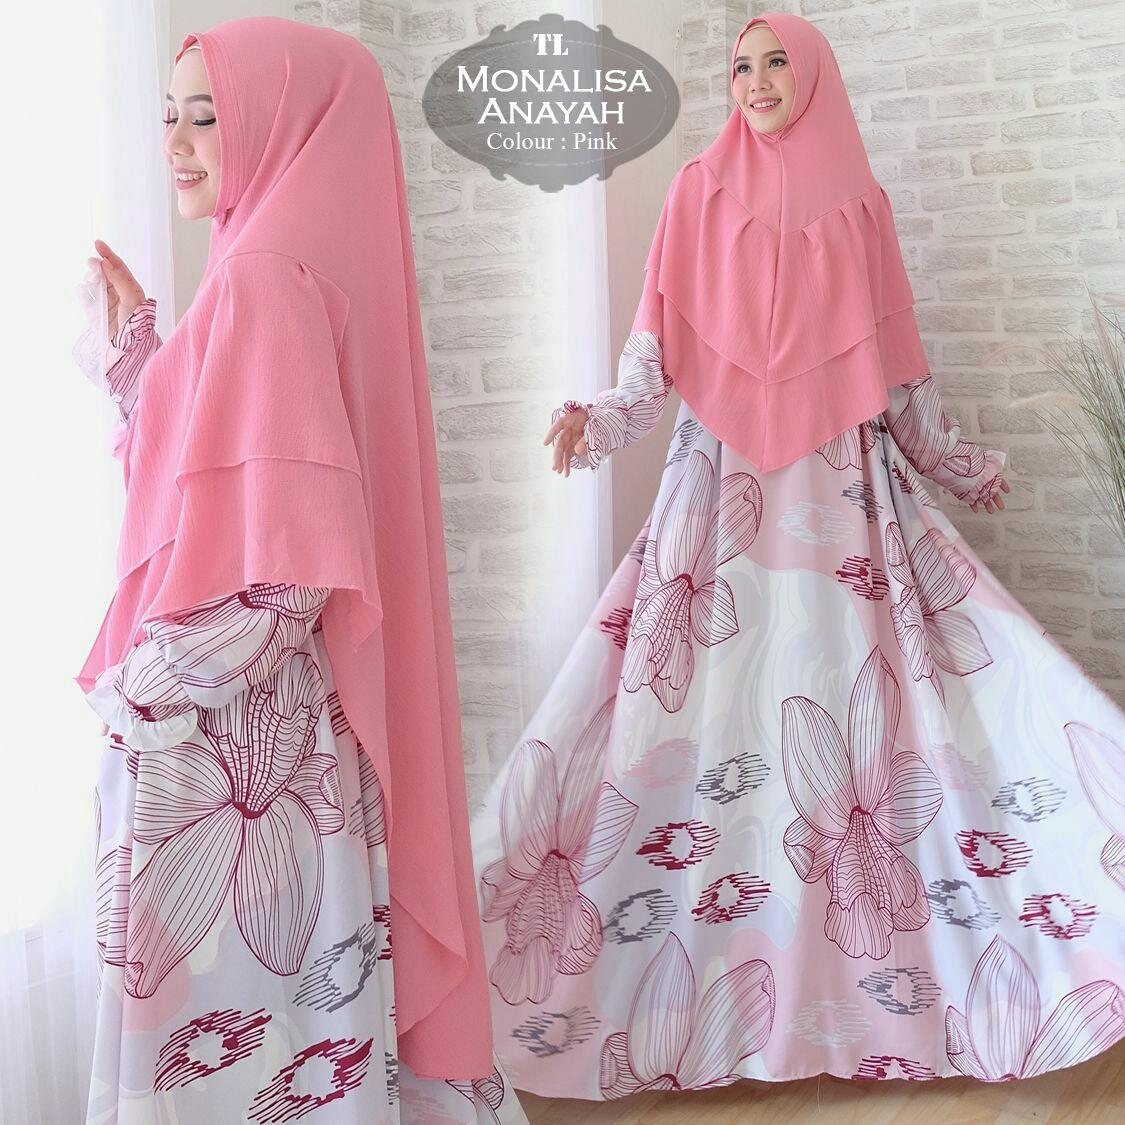 Humaira99 Gamis Syari Jumbo Muslim Dress Hijab Muslimah Atasan Wanita Monalisa Xxl Promo Beli 1 Gratis 1